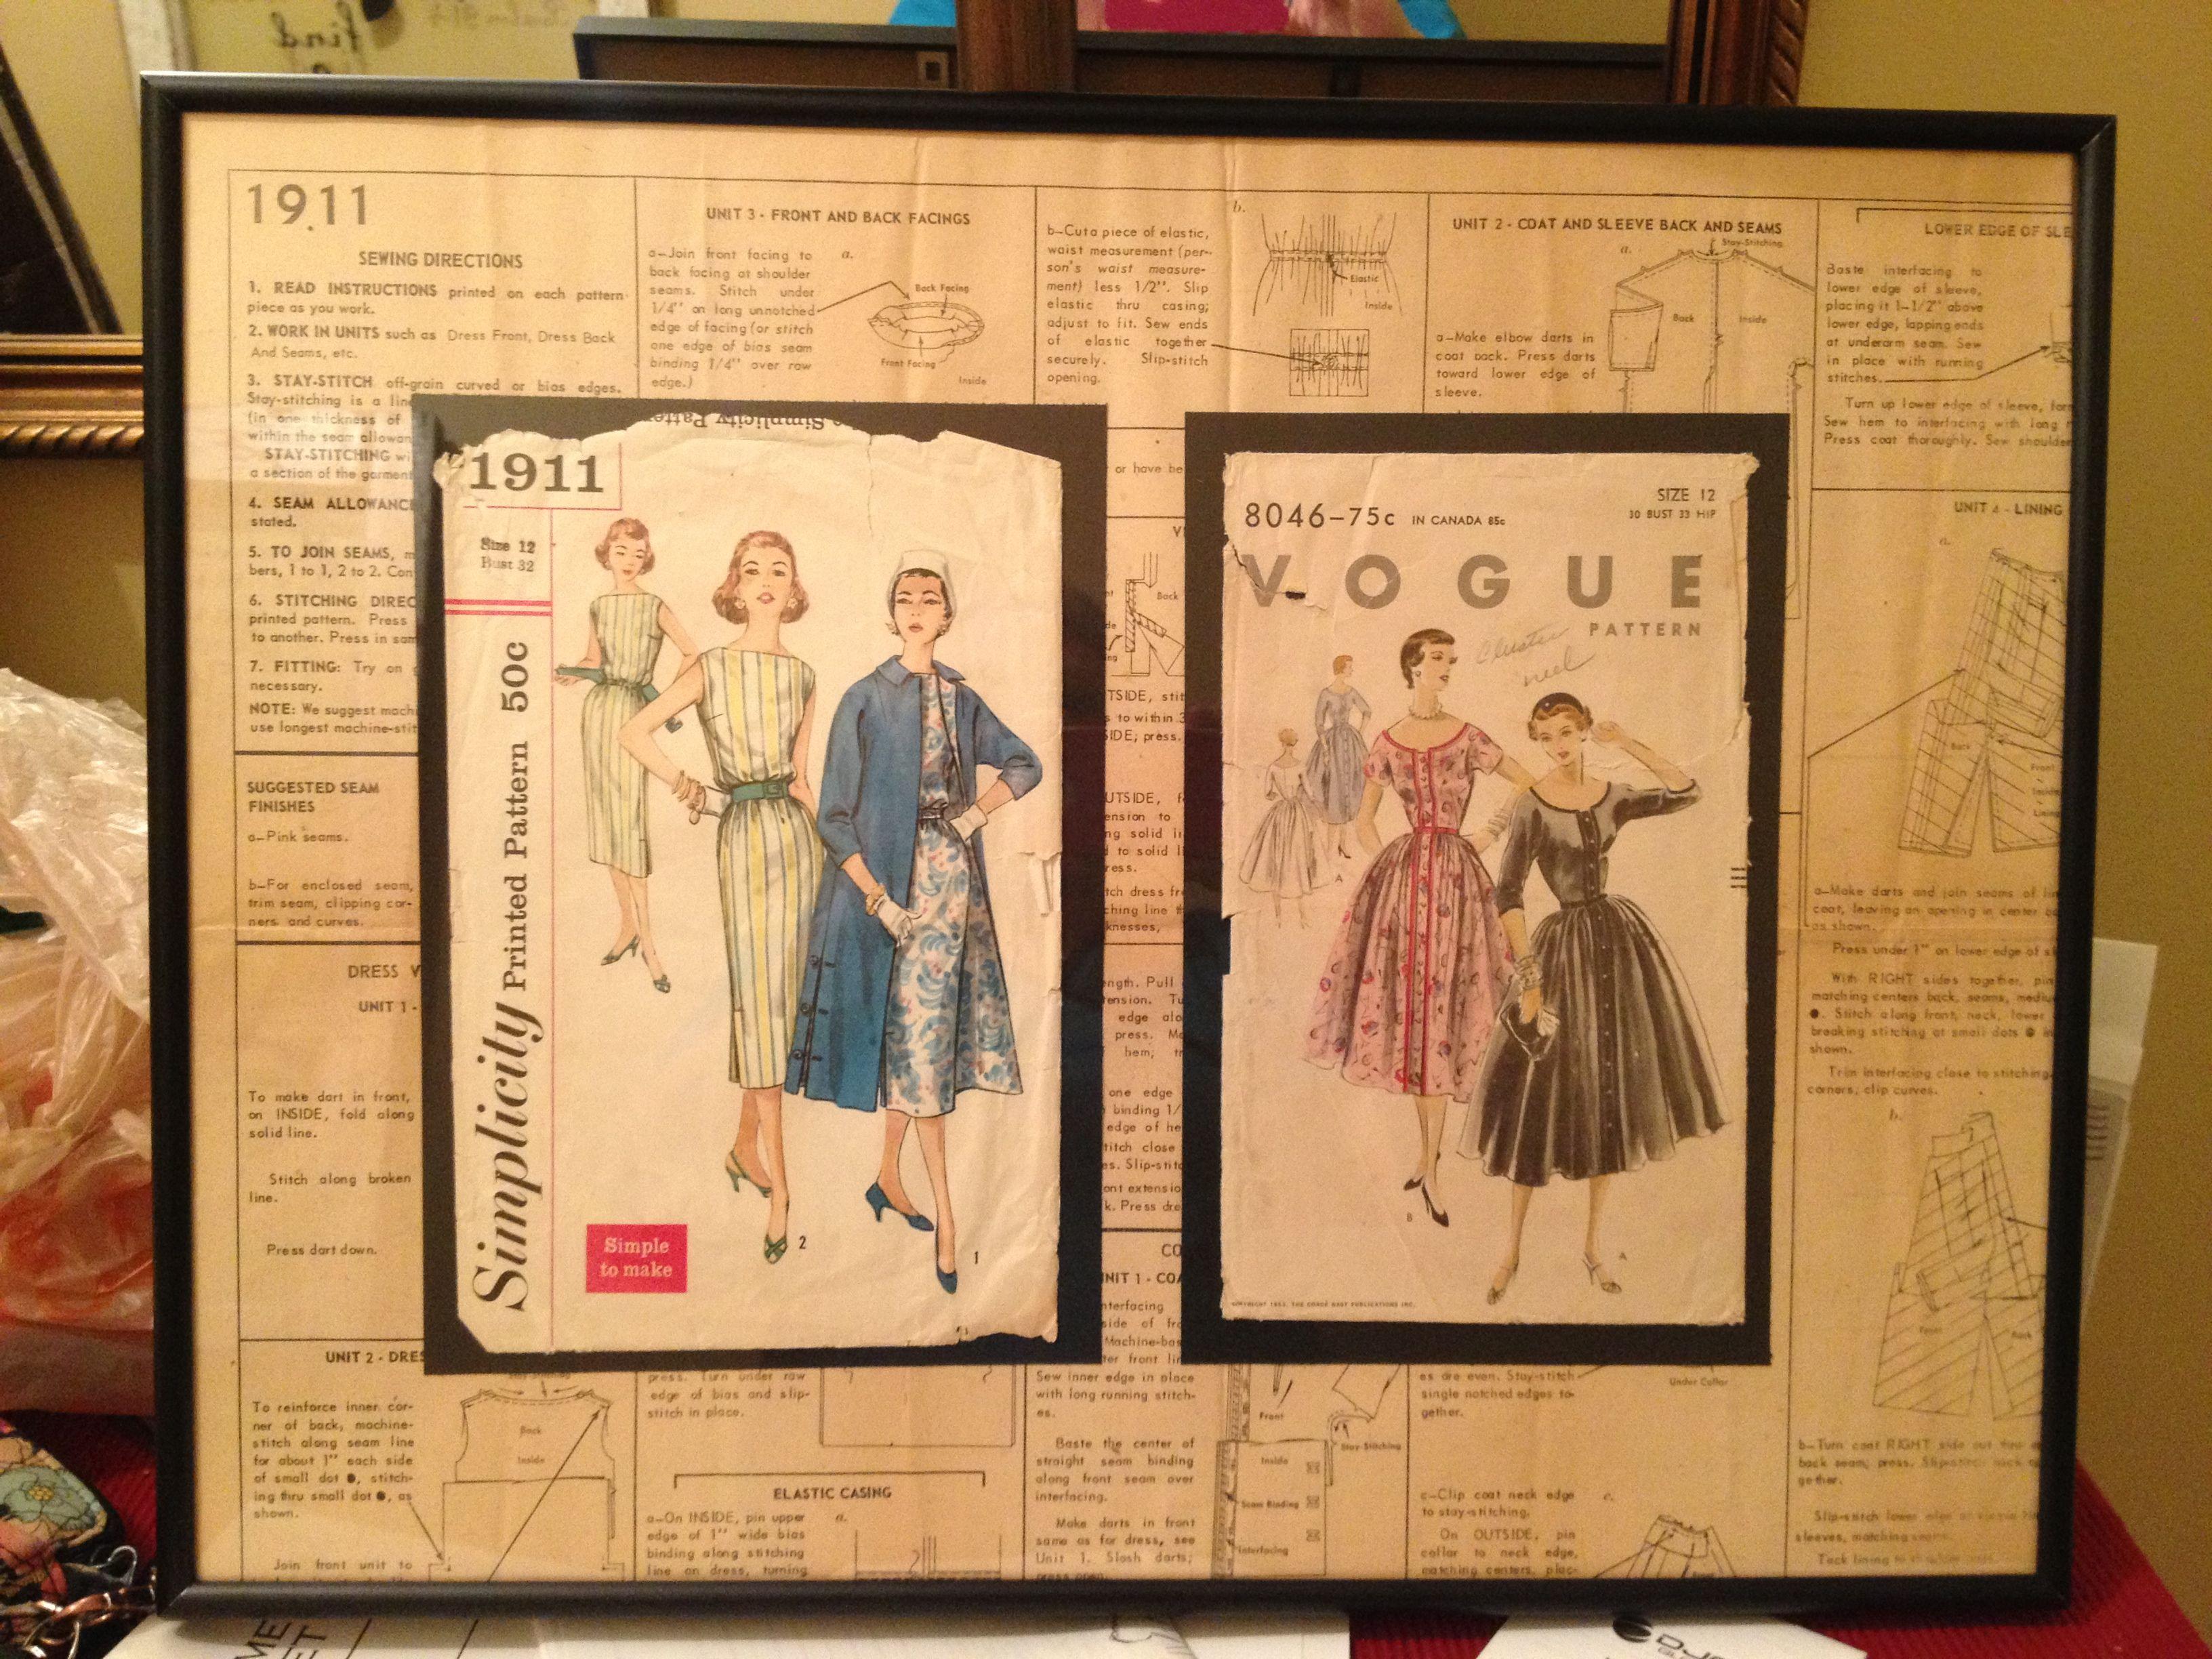 Framed vintage patterns using the instruction sheet as background